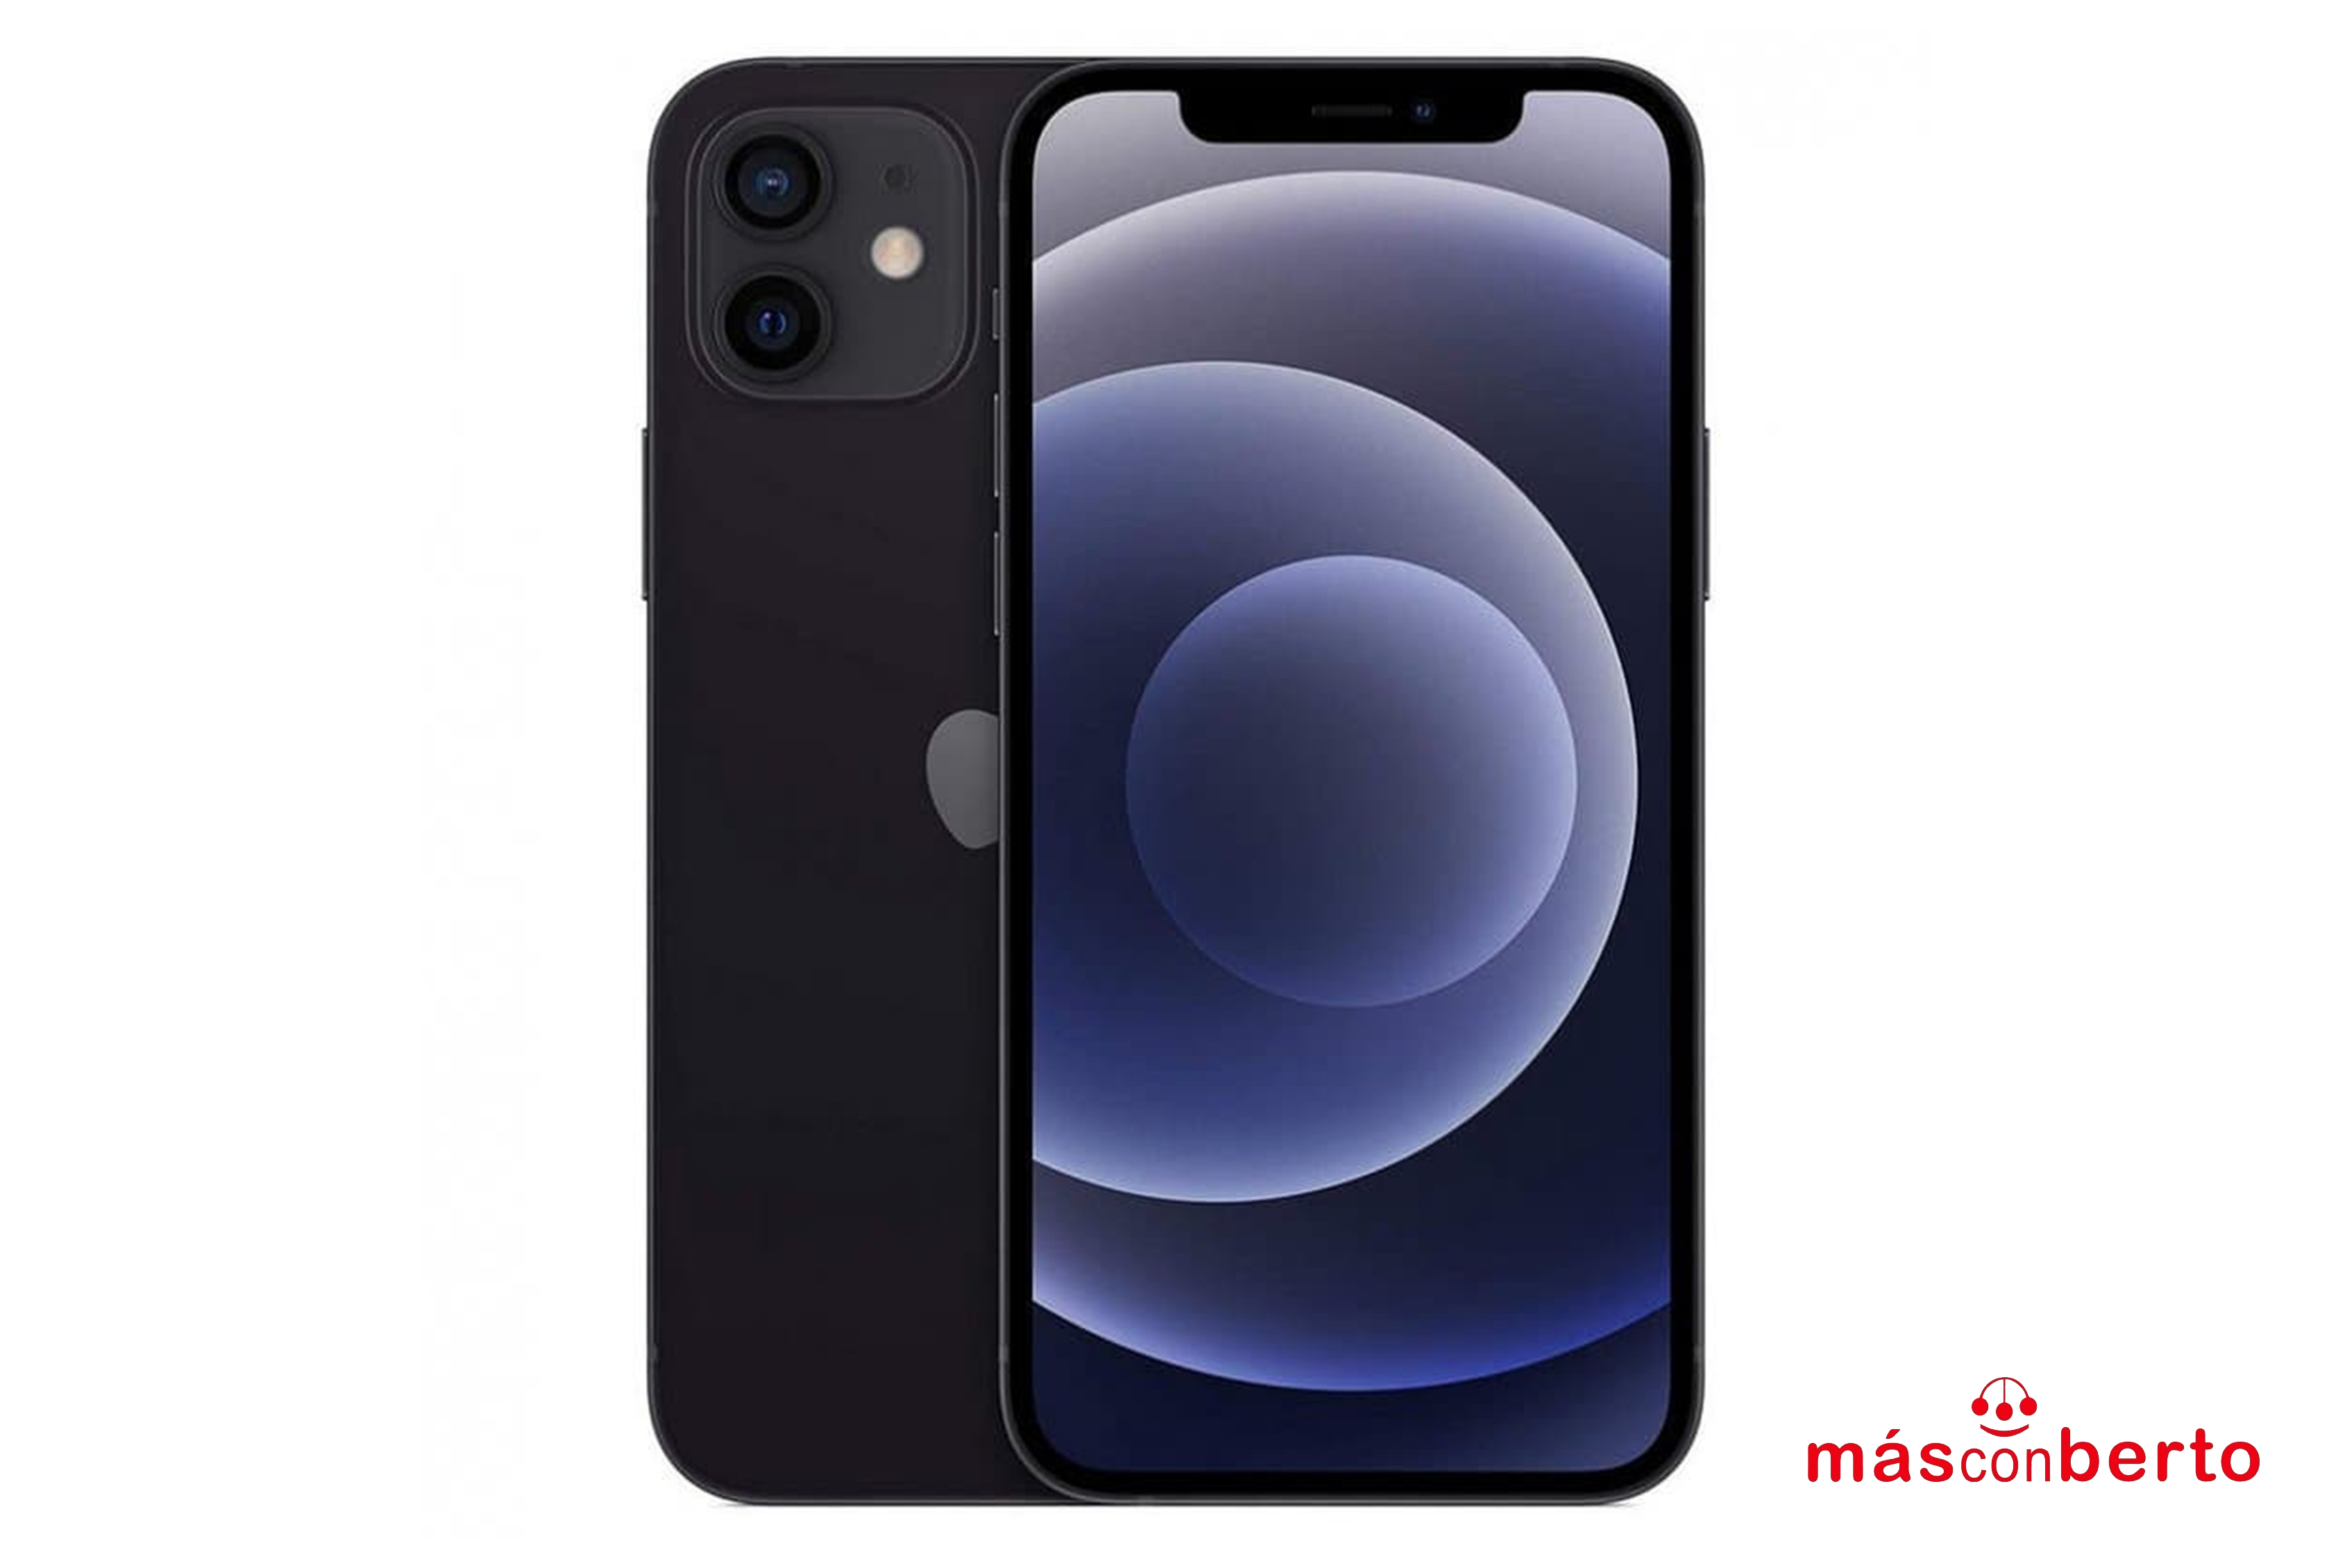 Móvil Apple Iphone 12 128Gb...